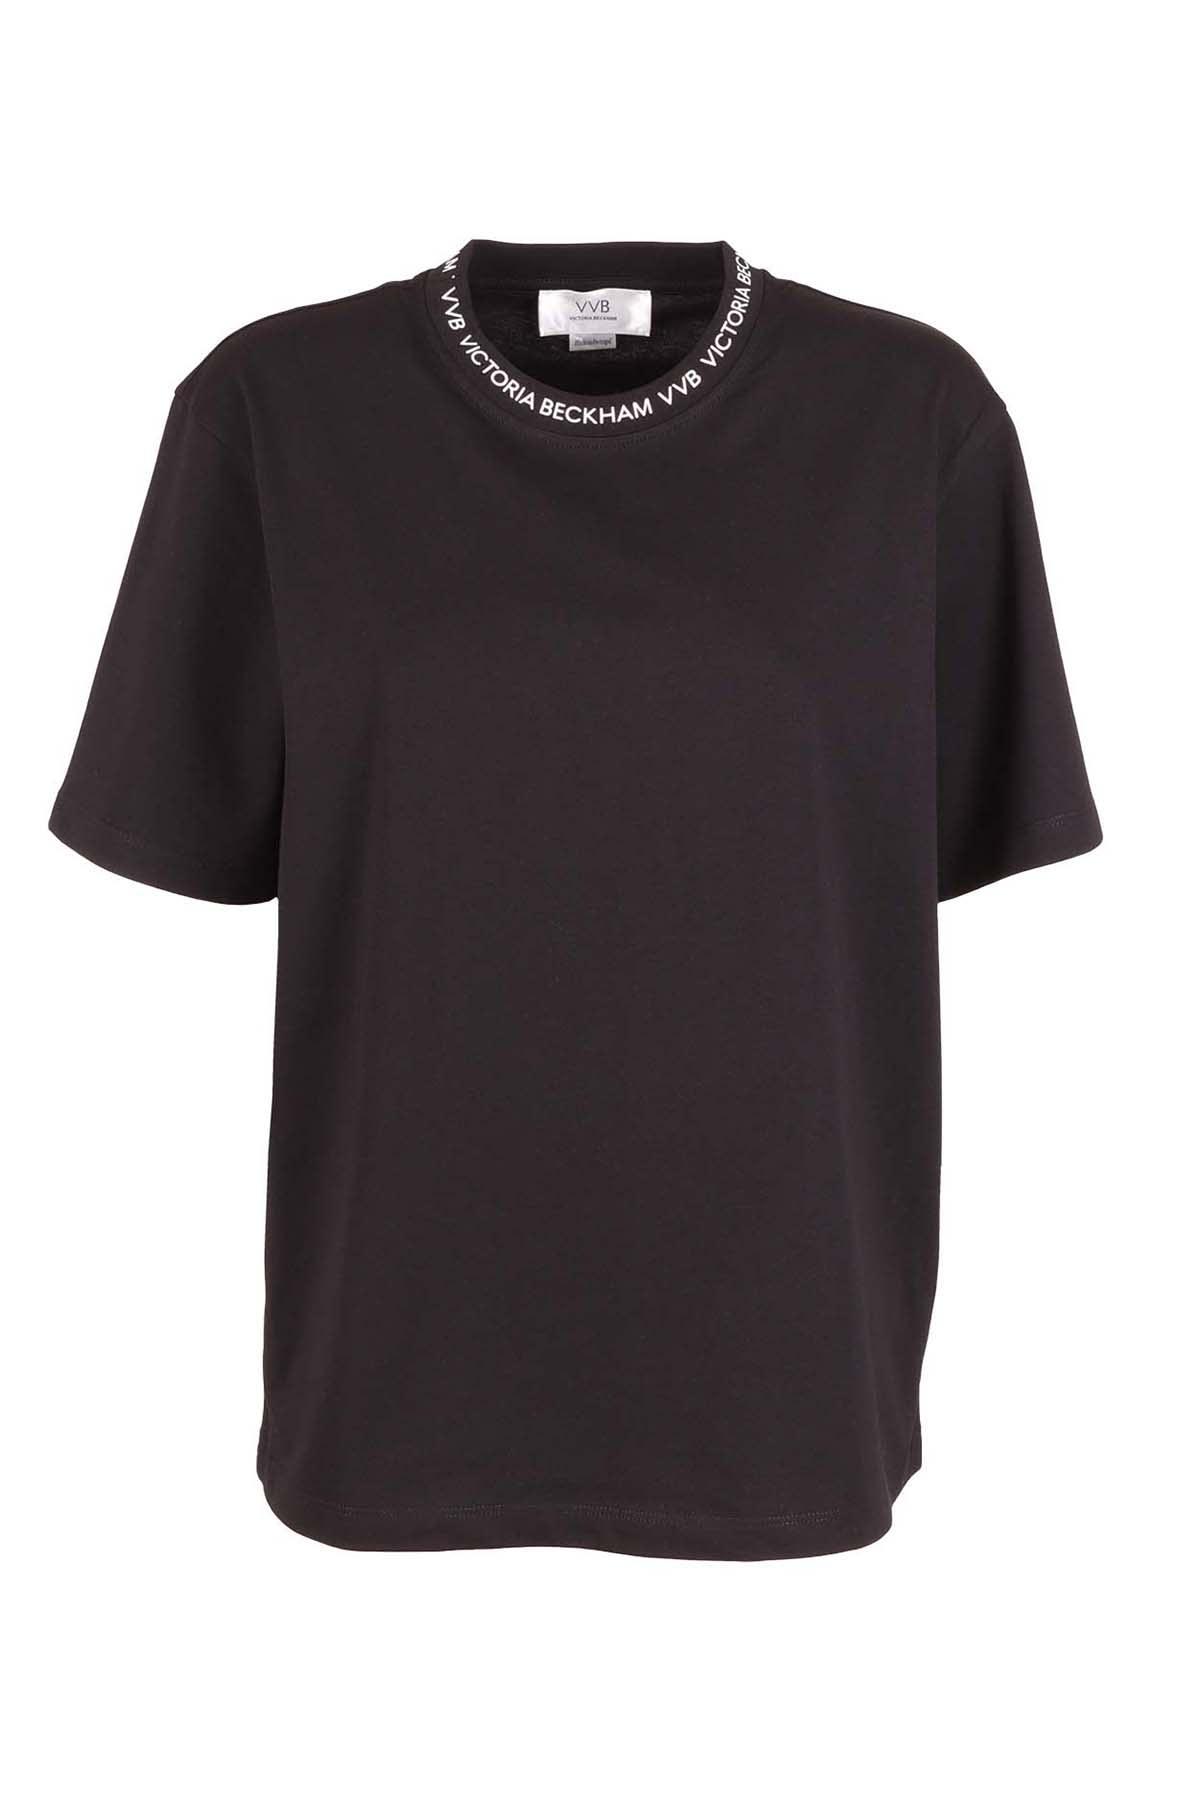 Victoria Victoria Beckham Short Sleeve T-Shirt